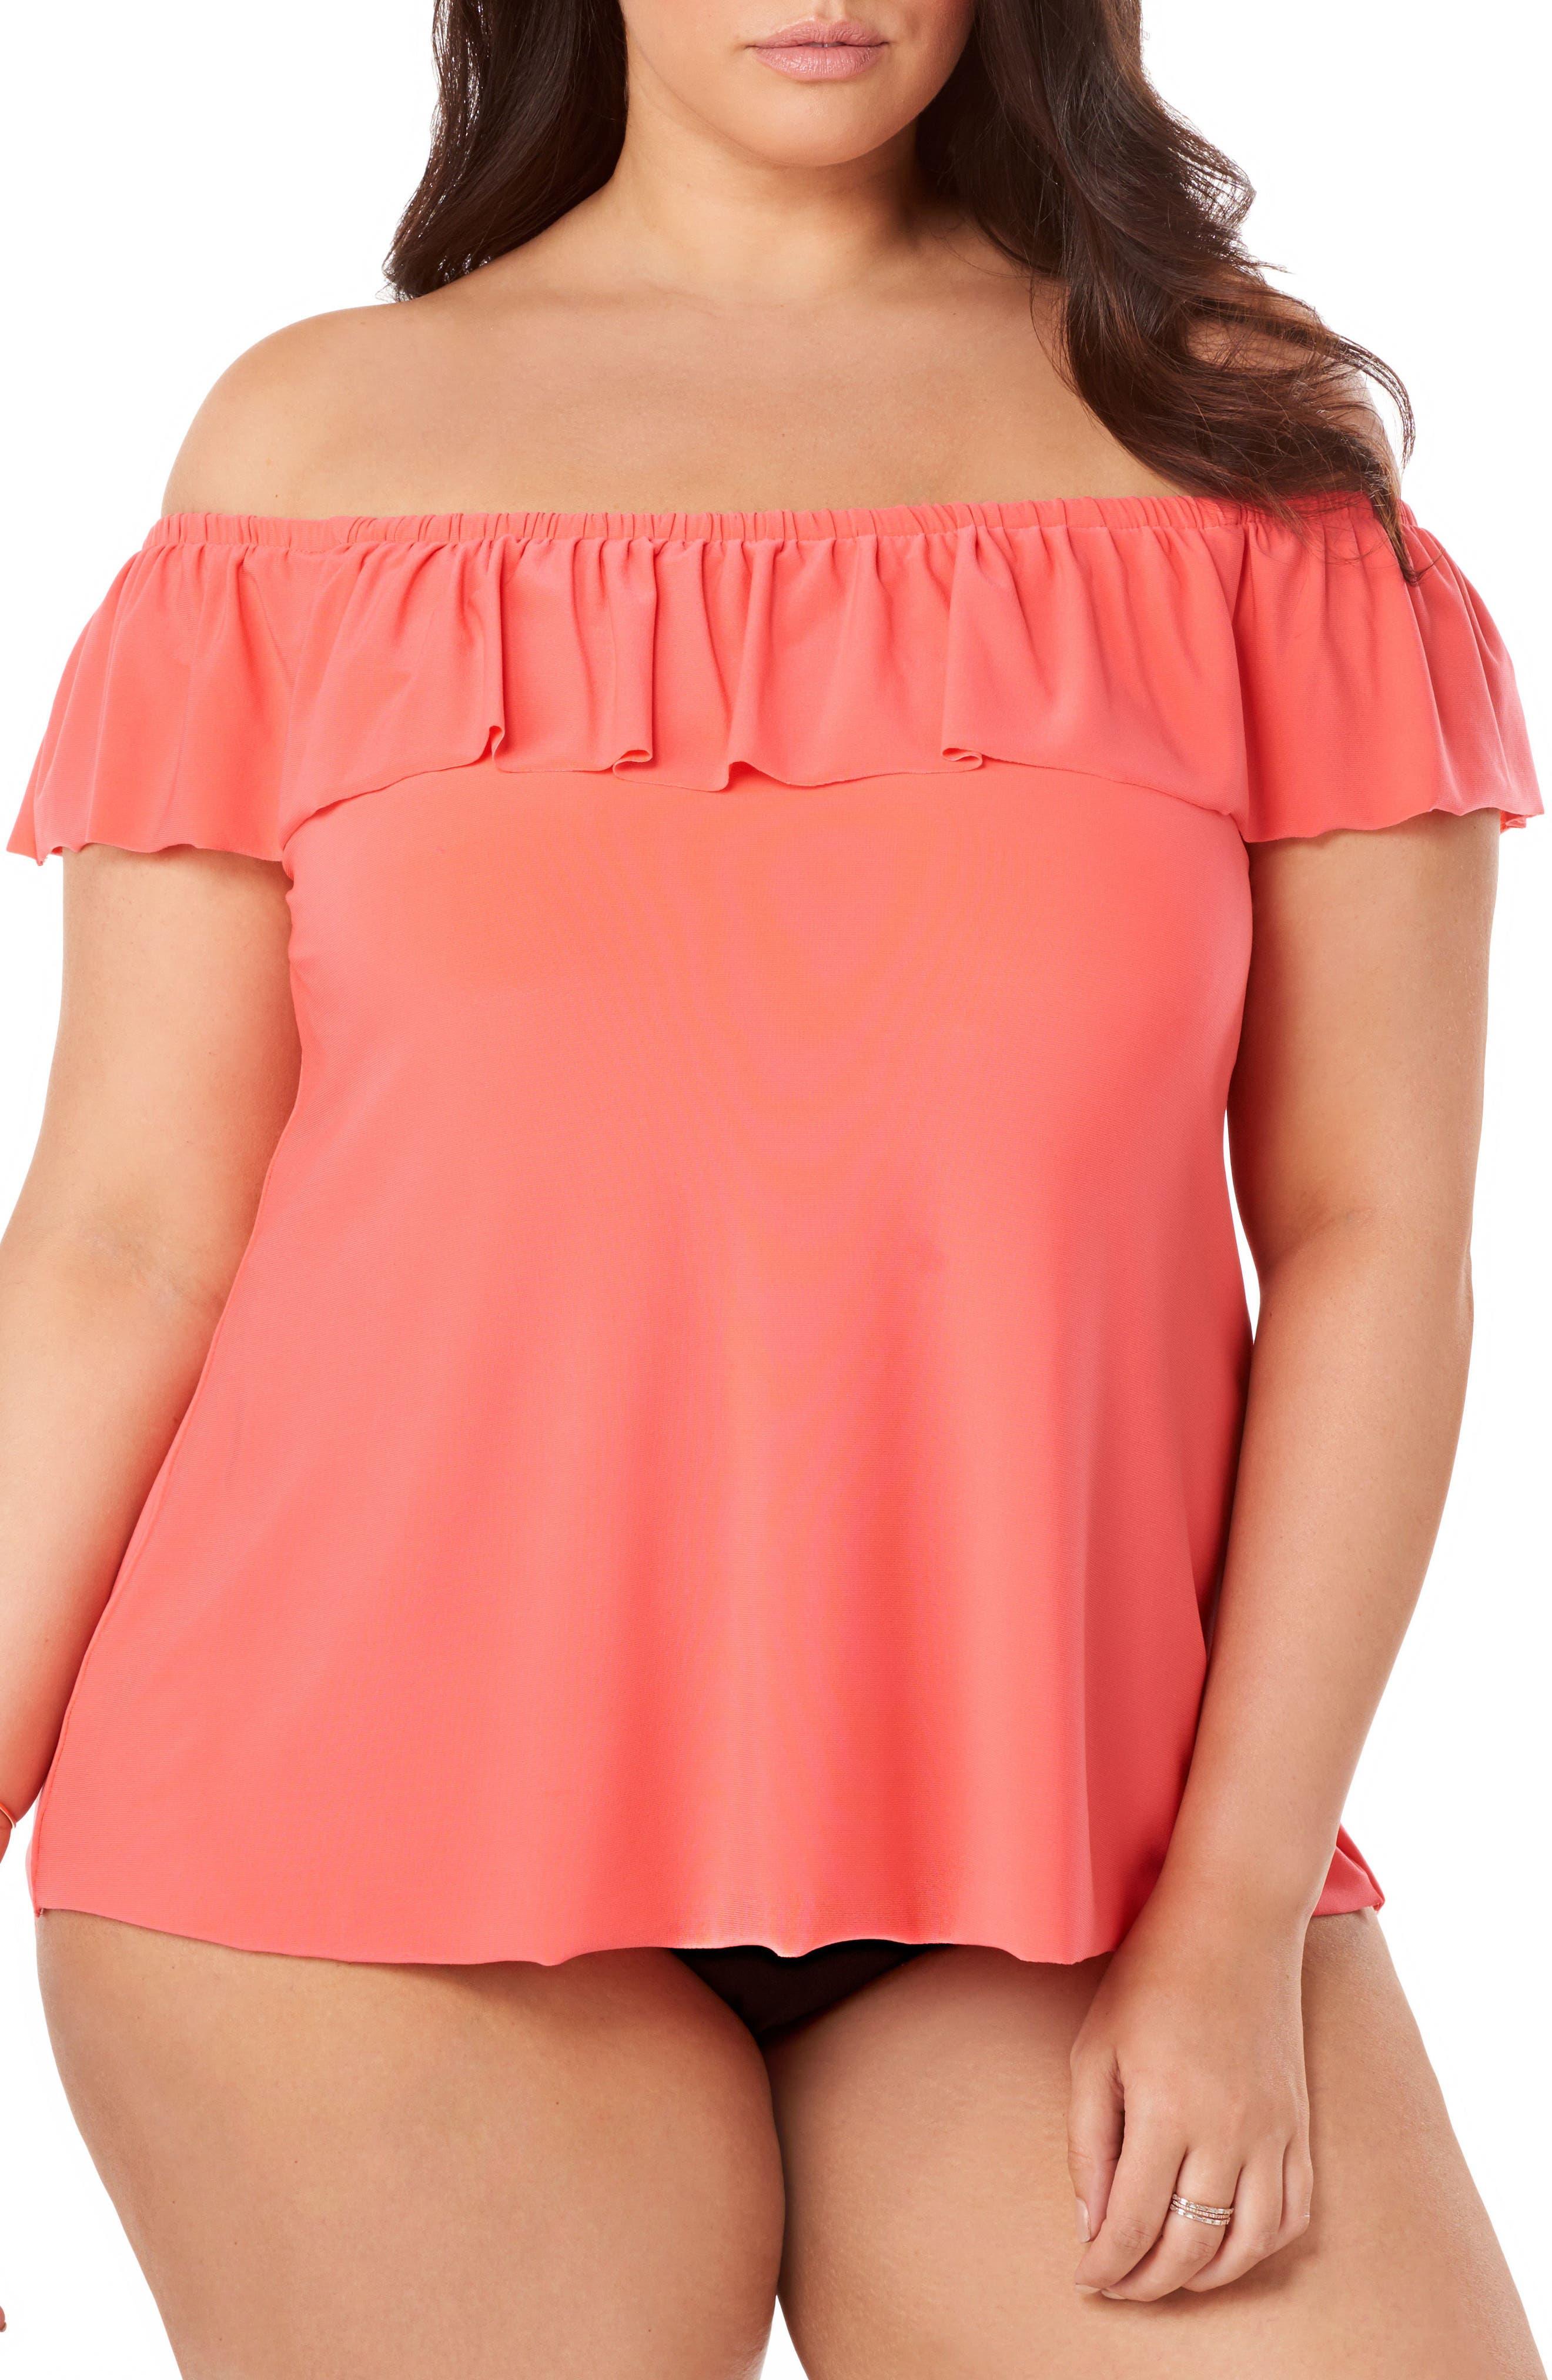 Alternate Image 1 Selected - Magicsuit® Kris Tankini Top (Plus Size)